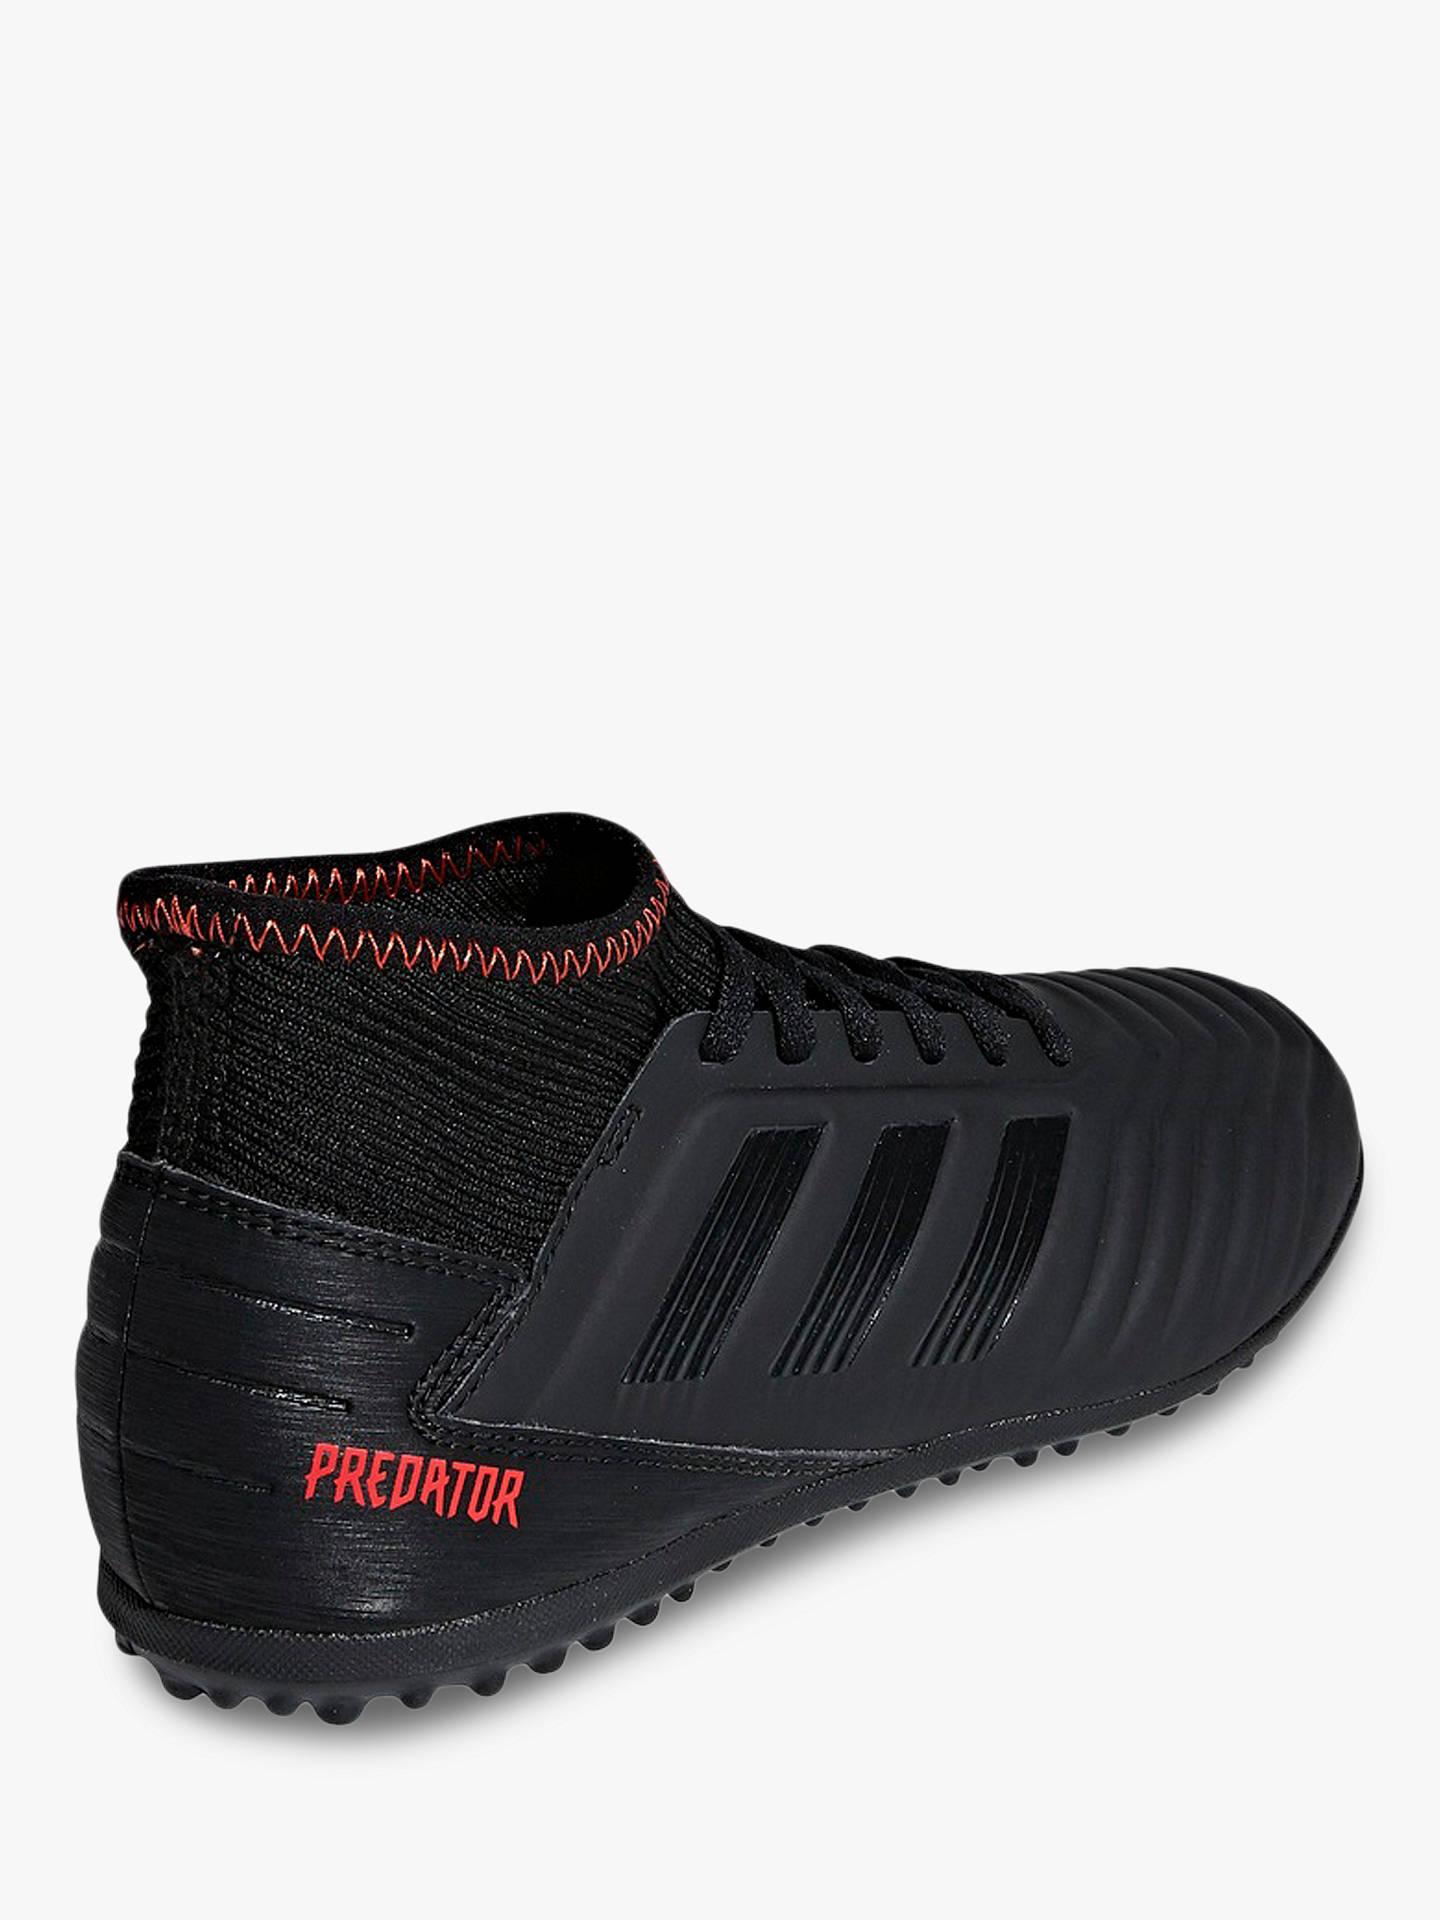 best website half price huge selection of adidas Children's Predator Tango 19.3 Turf Football Boots ...